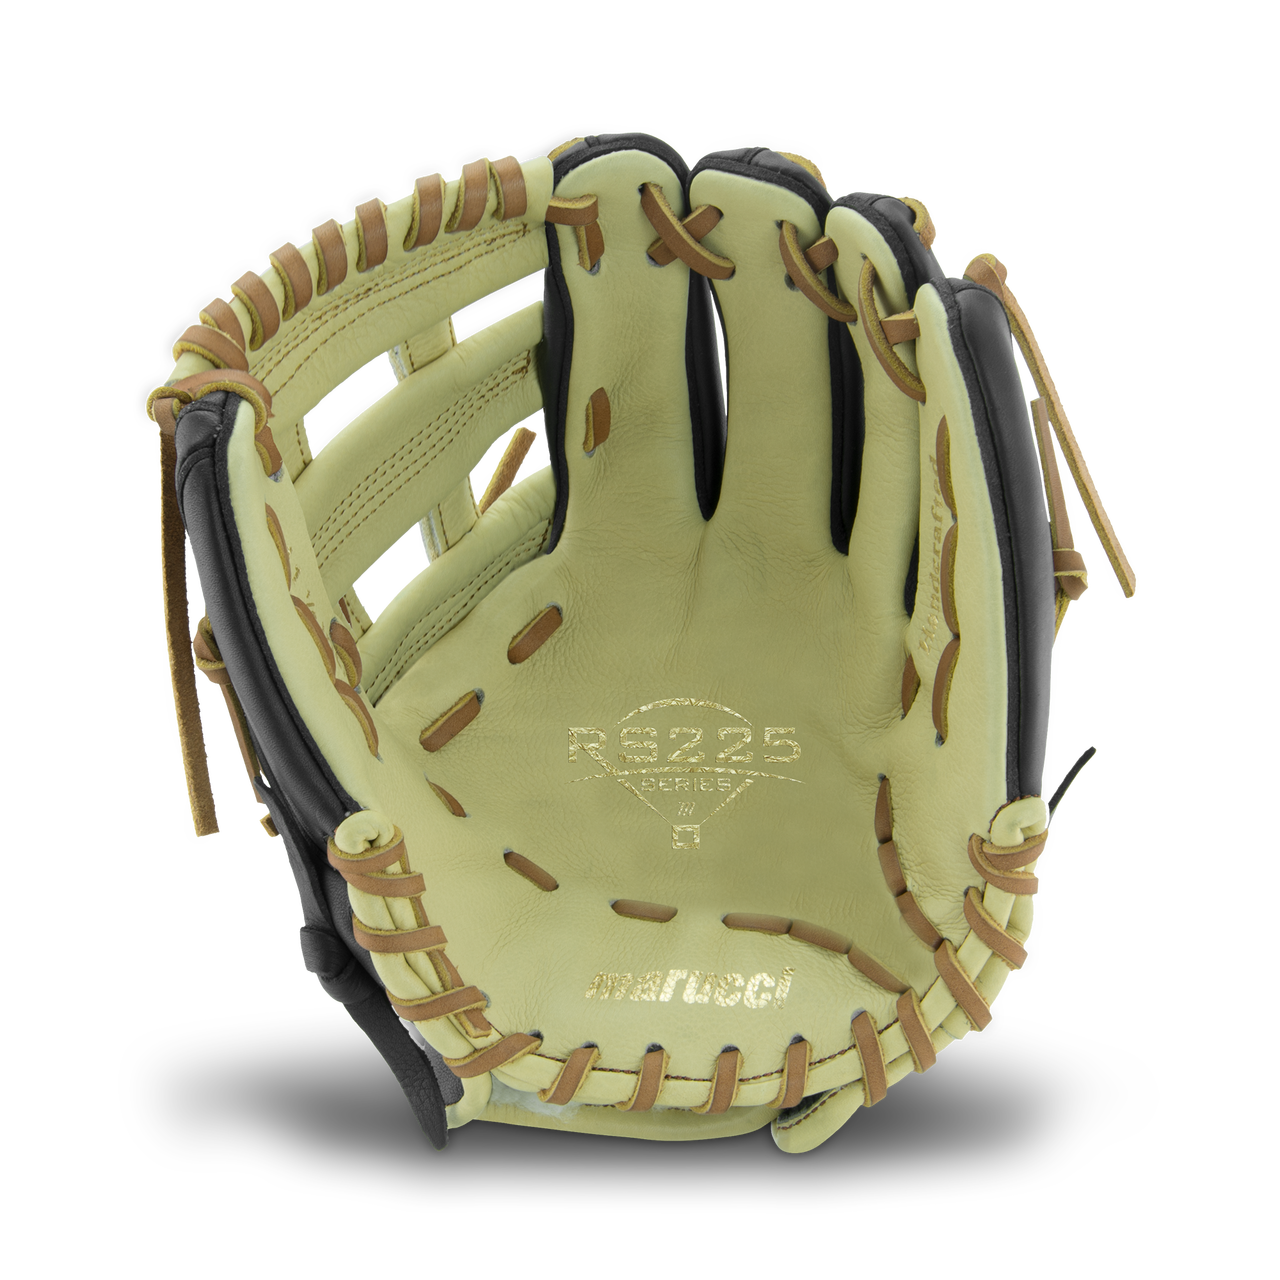 Marucci RS225 Series 11.5 in H-Web Glove